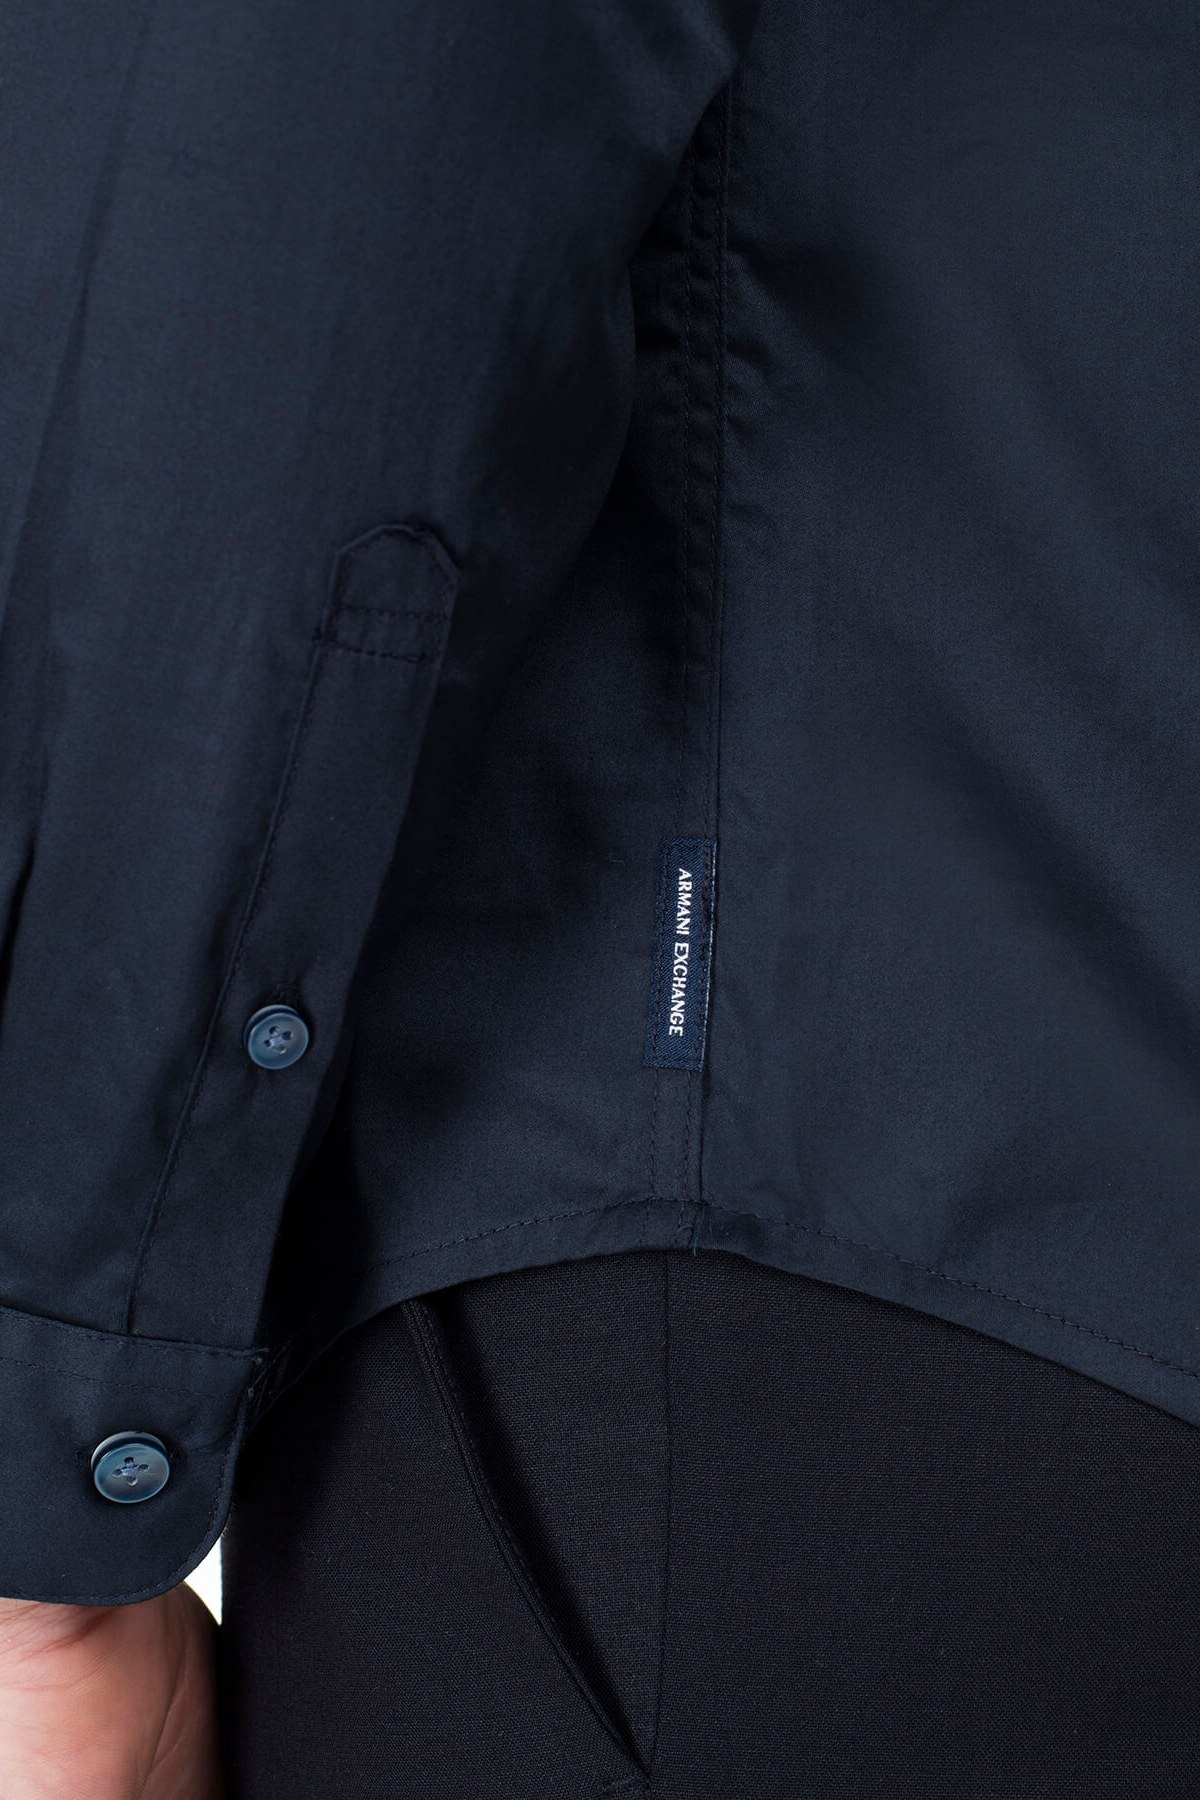 Armani Exchange Erkek Gömlek 3HZC14 ZNAUZ 1510 LACİVERT